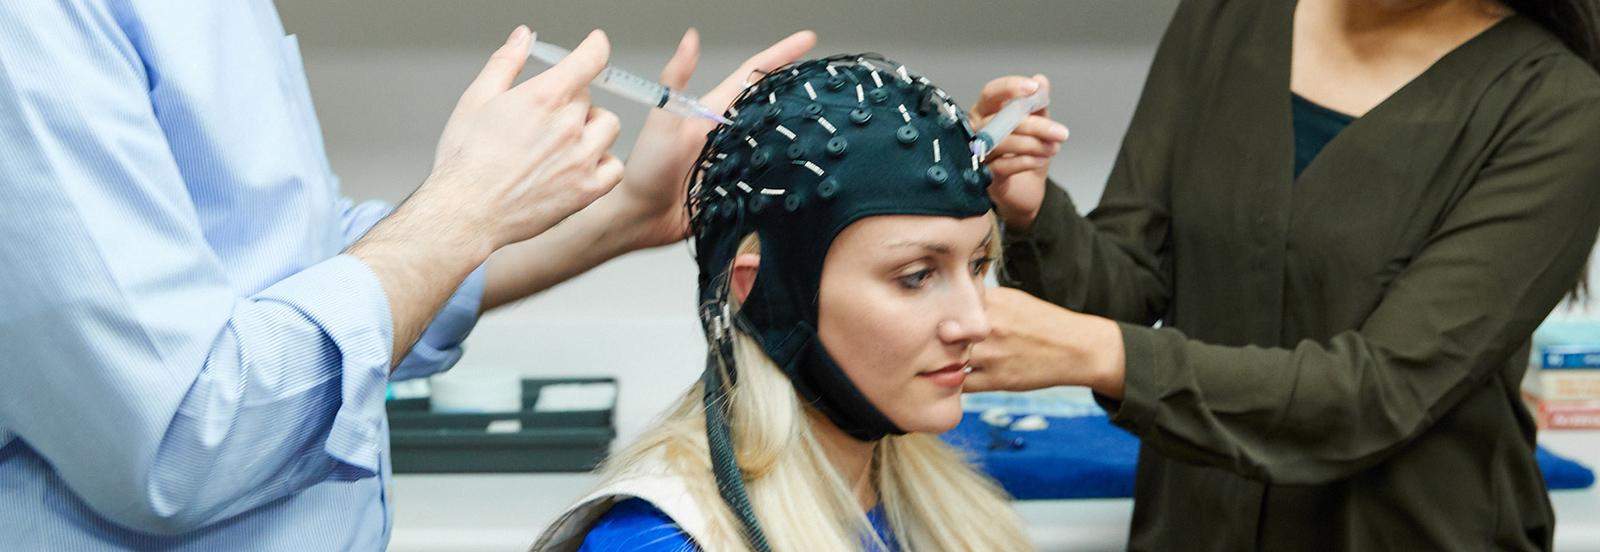 Subject with EEG cap